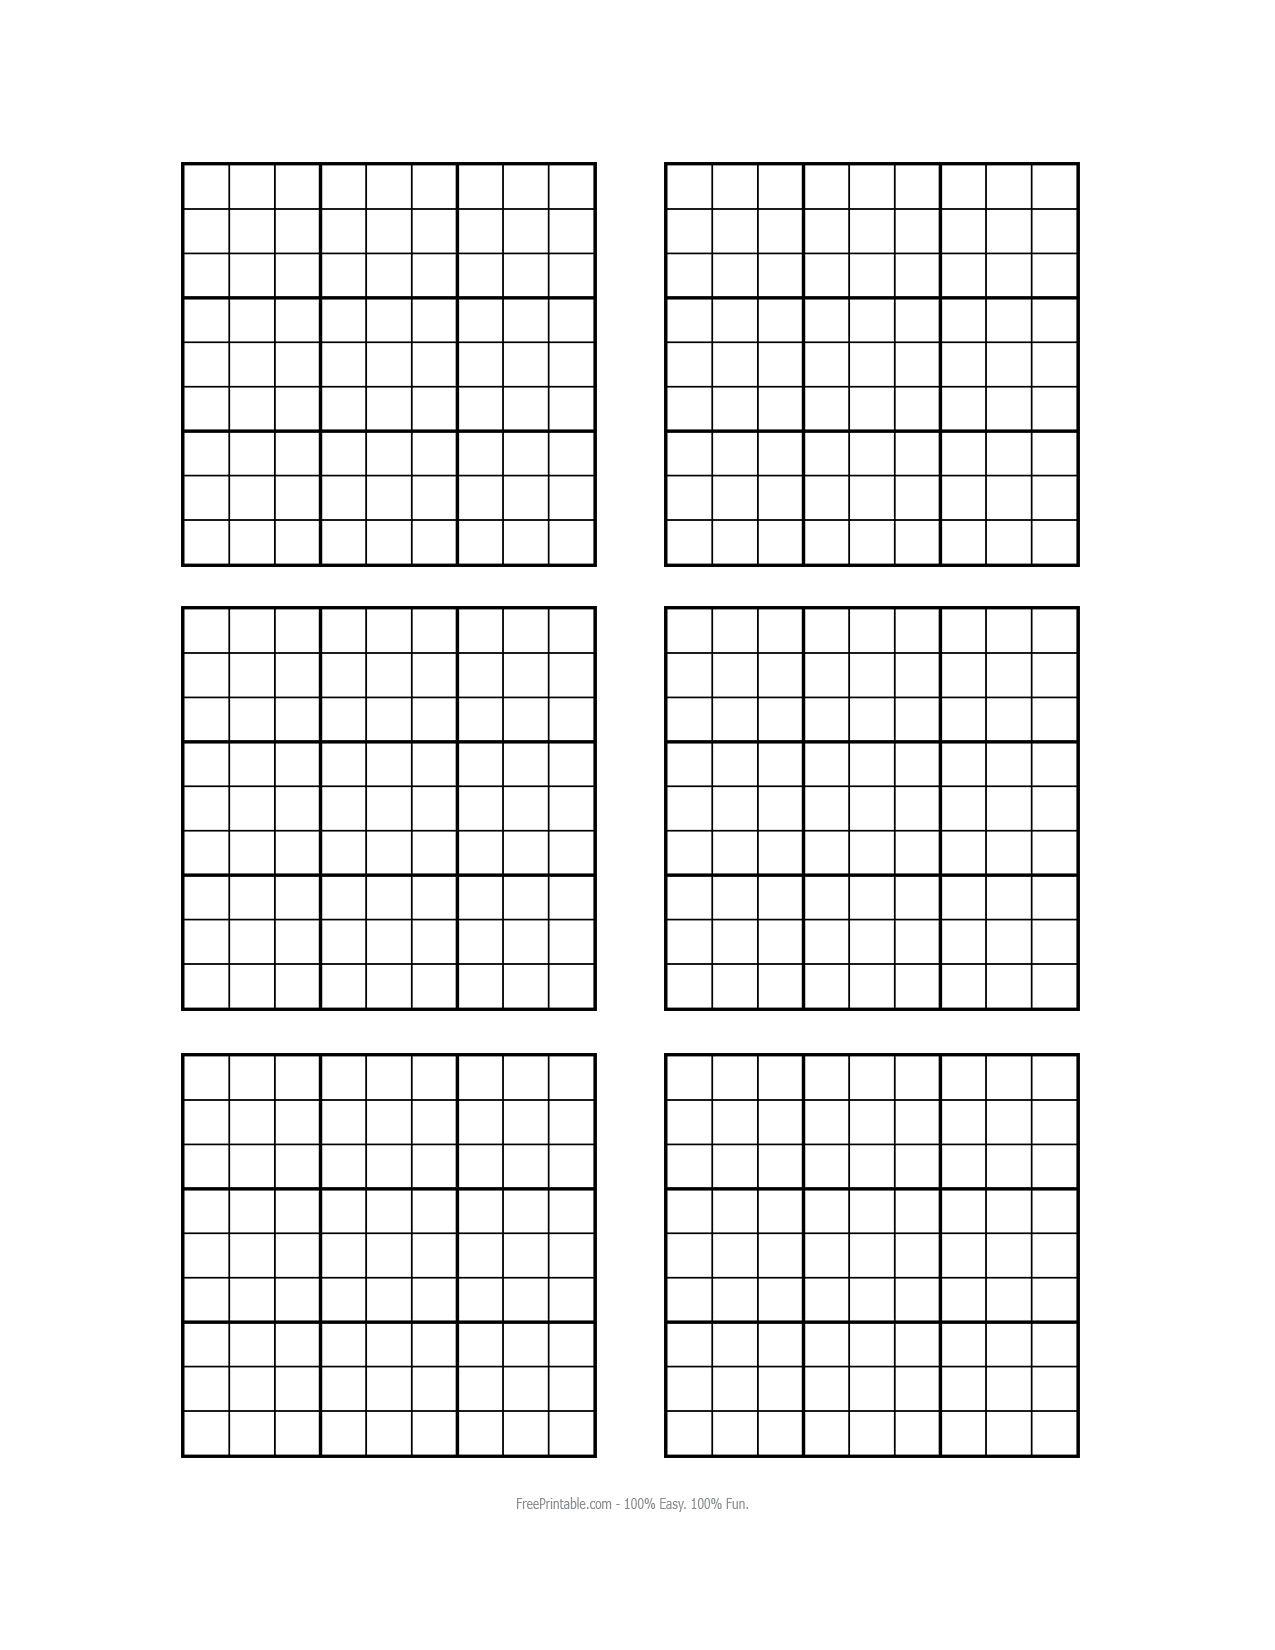 Free Printable Blank Sudoku Grids | Sudoku Printable, Grid